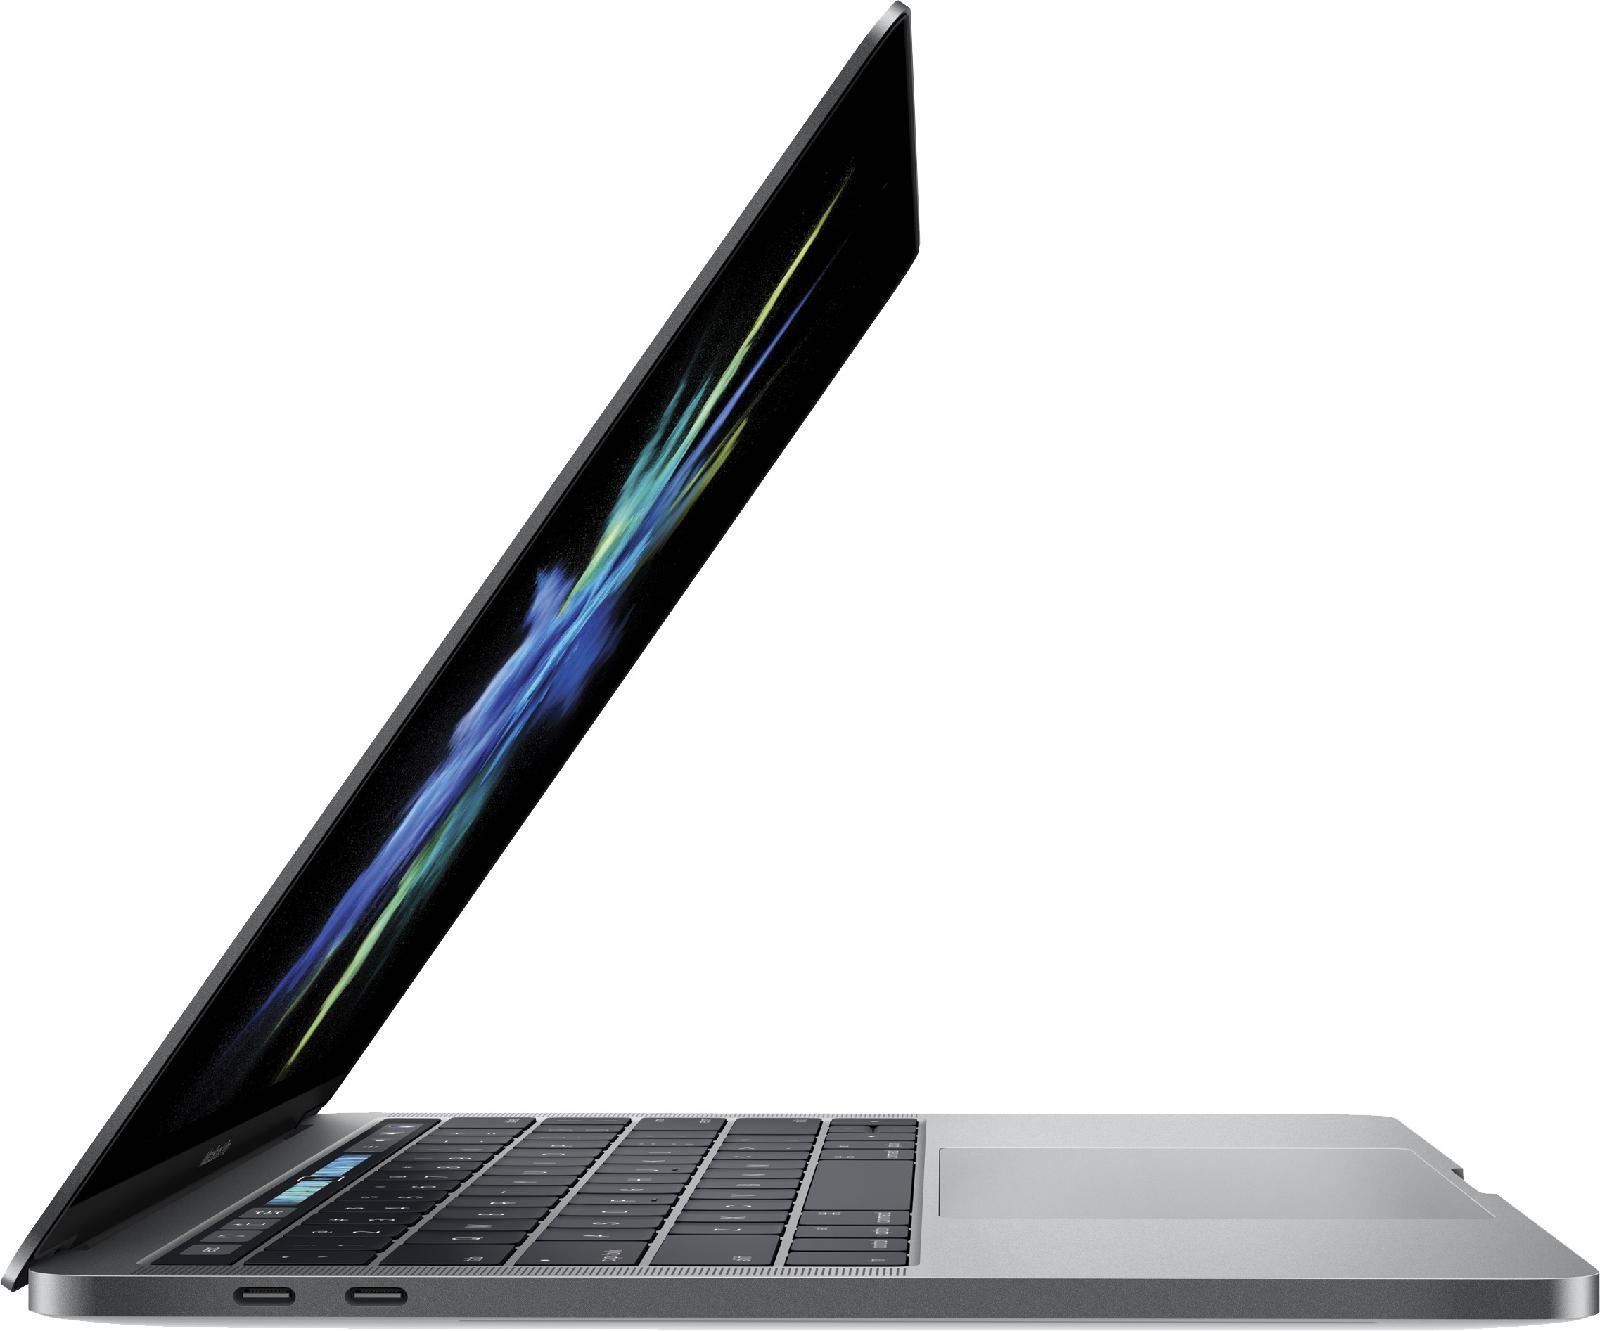 intel core ottava generazione - foto macbook pro 13